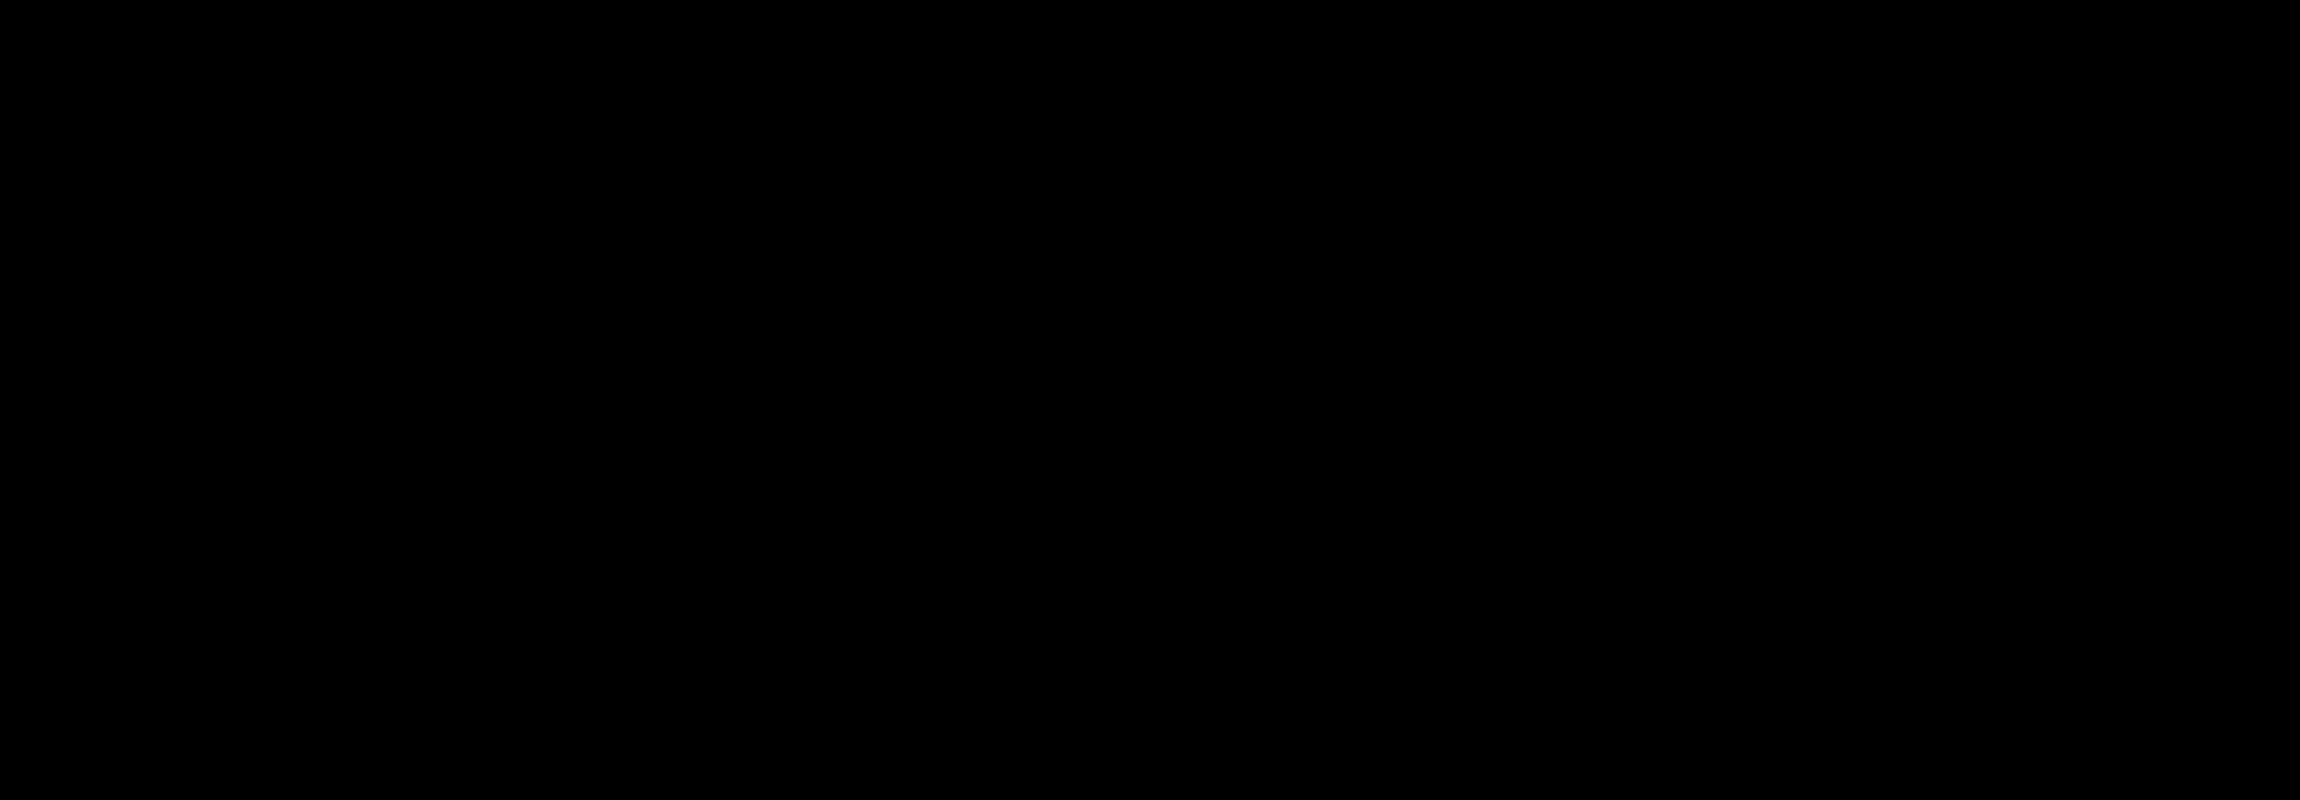 N-(4-((2-Amino-9H-purin-6-yloxy)methyl)benzyl)-4-((2,2,2-trifluoroacetamido)methyl)benzamide